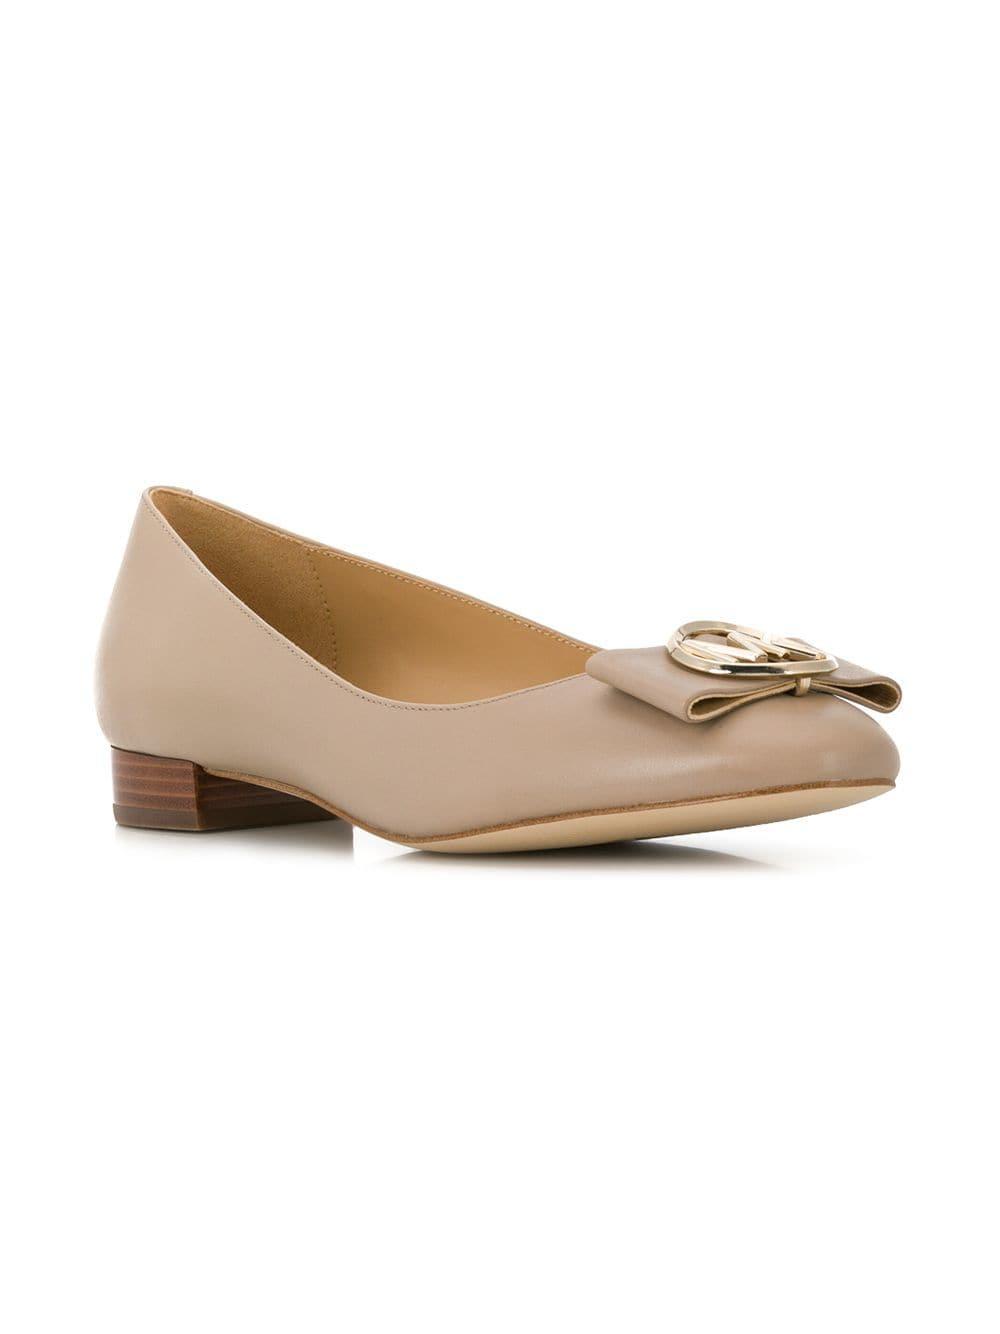 b0905b474b4 Michael Michael Kors Logo Plaque Ballerina Shoes in Natural - Lyst